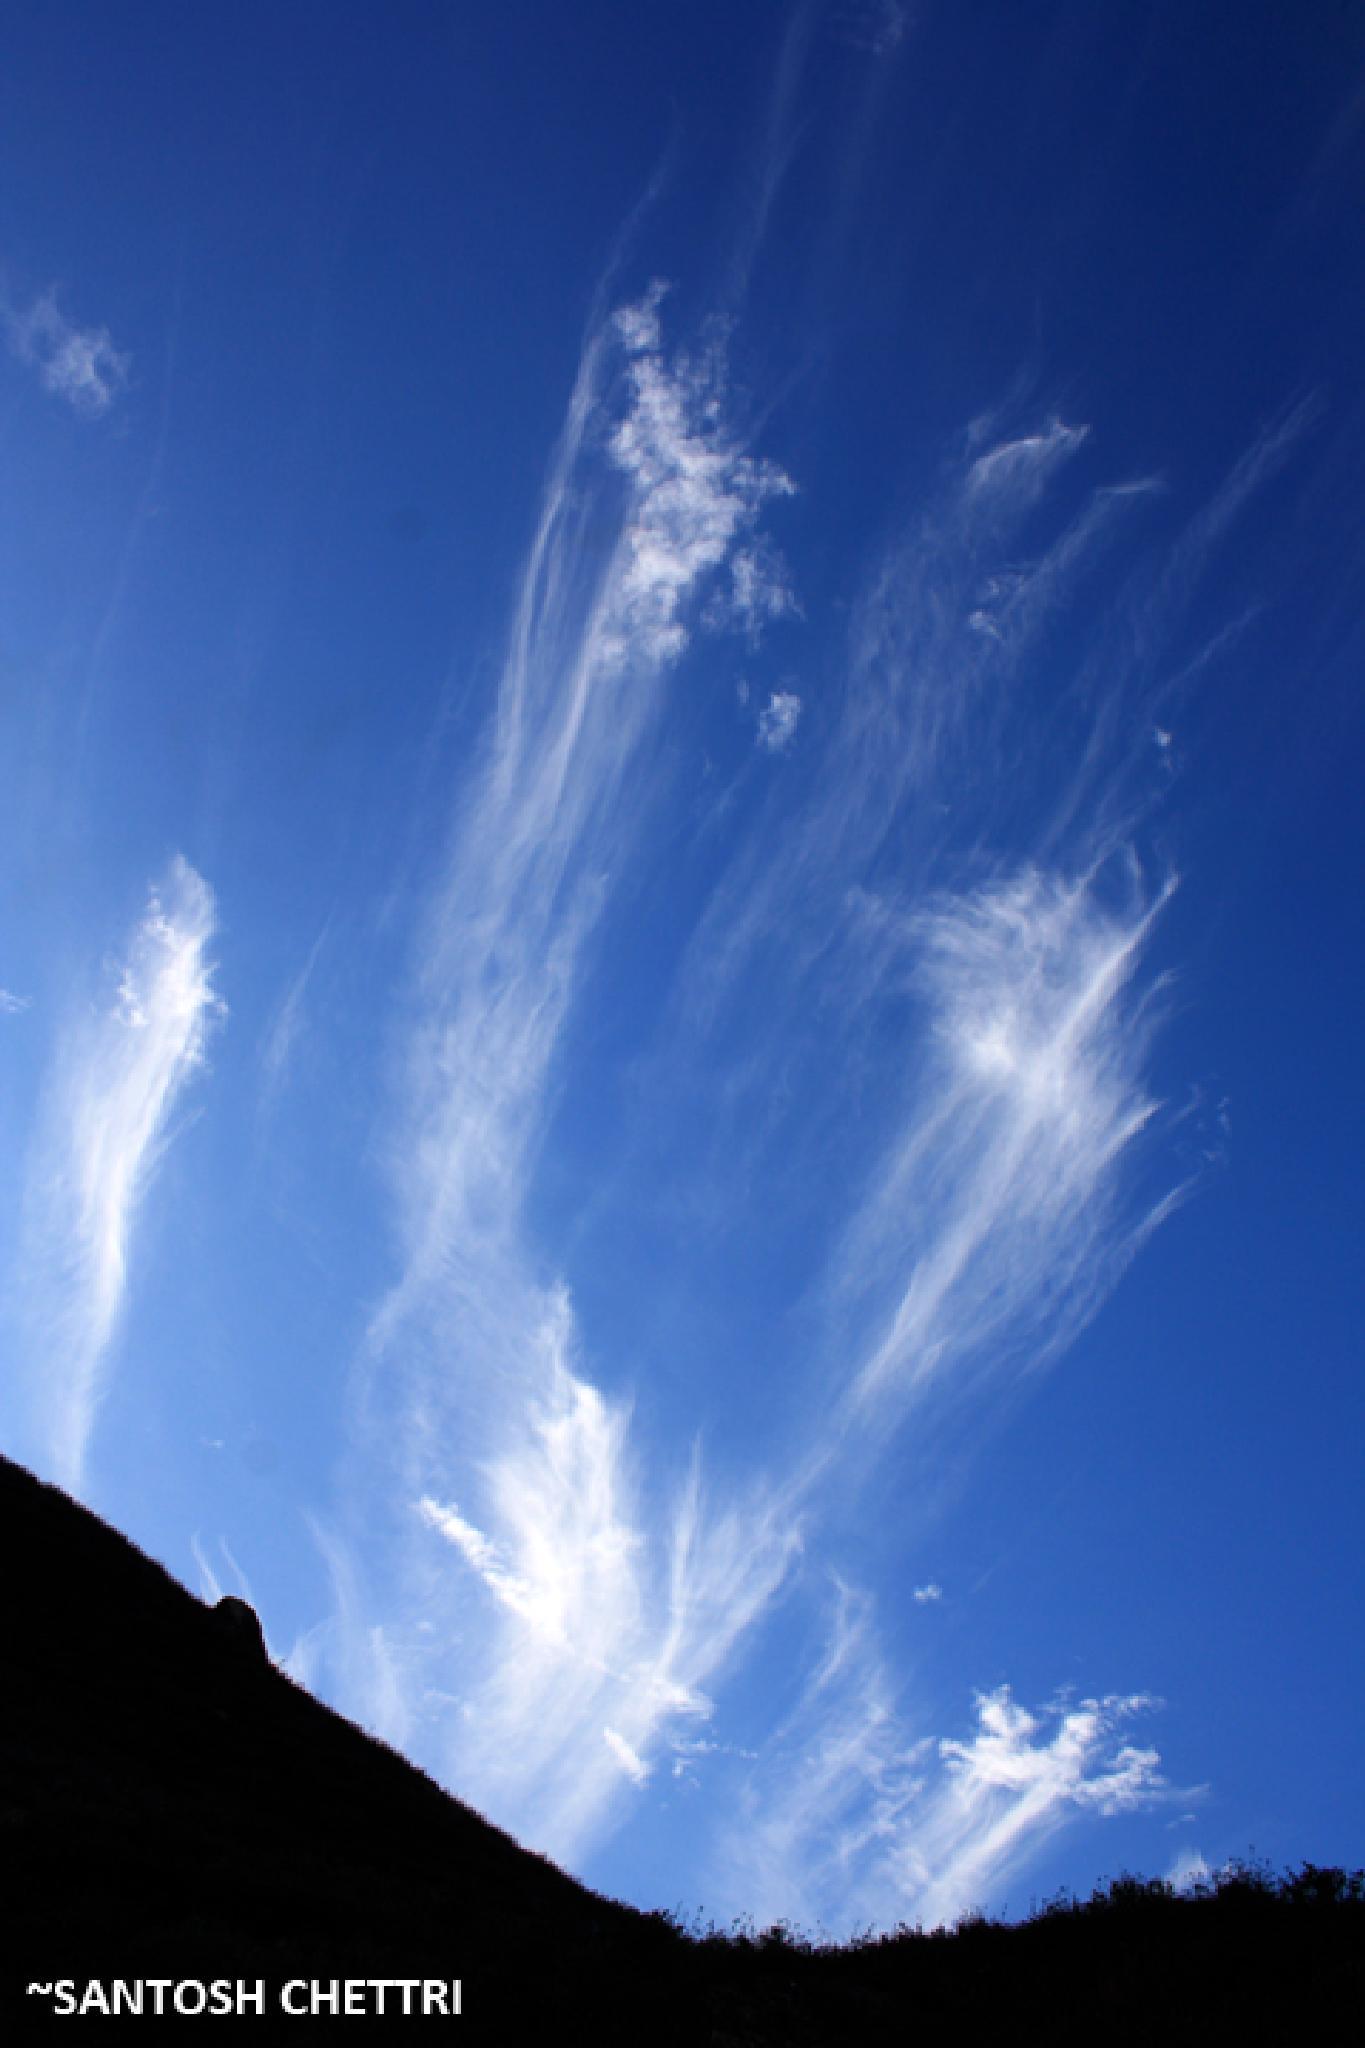 Dancing Clouds. by Santosh Chettri